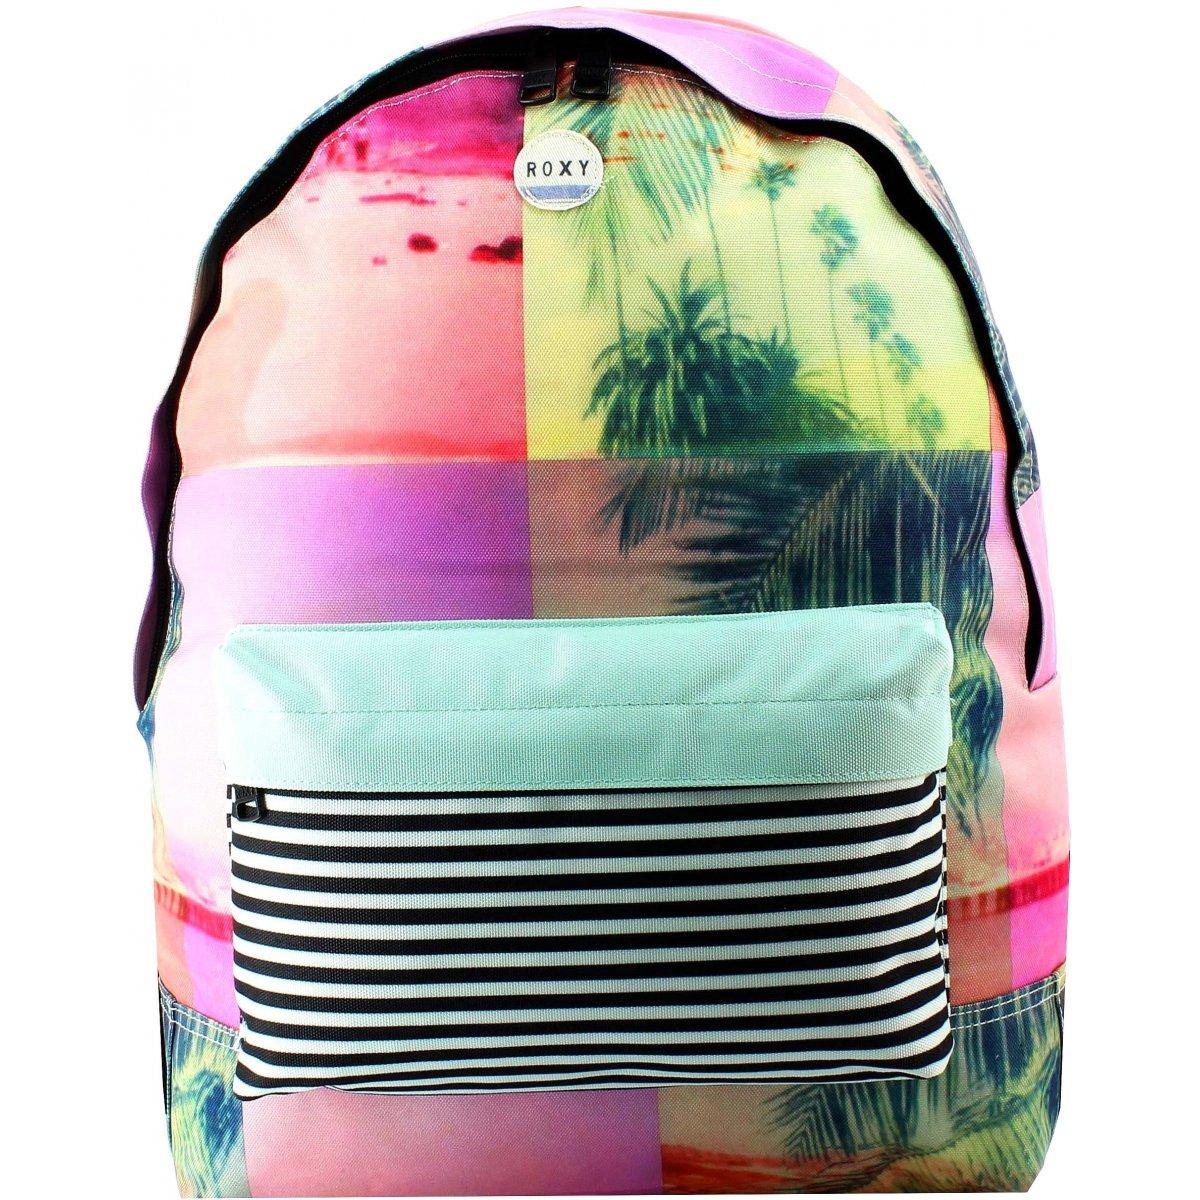 sac dos scolaire roxy p03218wcd7 couleur principale assortis. Black Bedroom Furniture Sets. Home Design Ideas